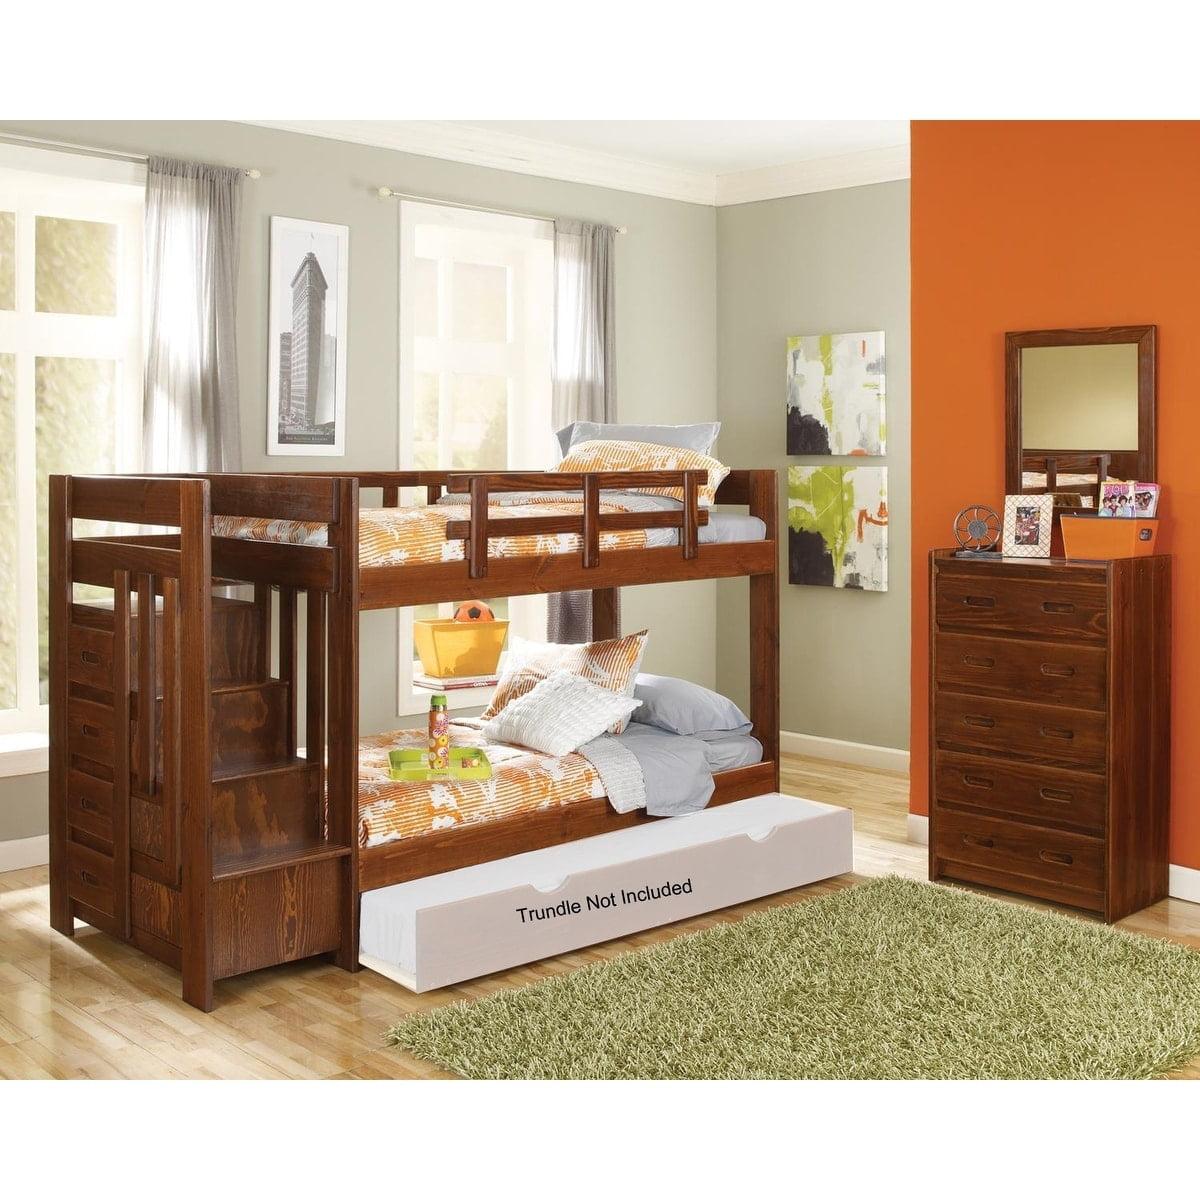 Chelsea Home Furniture Darkwoods Dark Twin over Twin Reversible Stair Bunk Bed